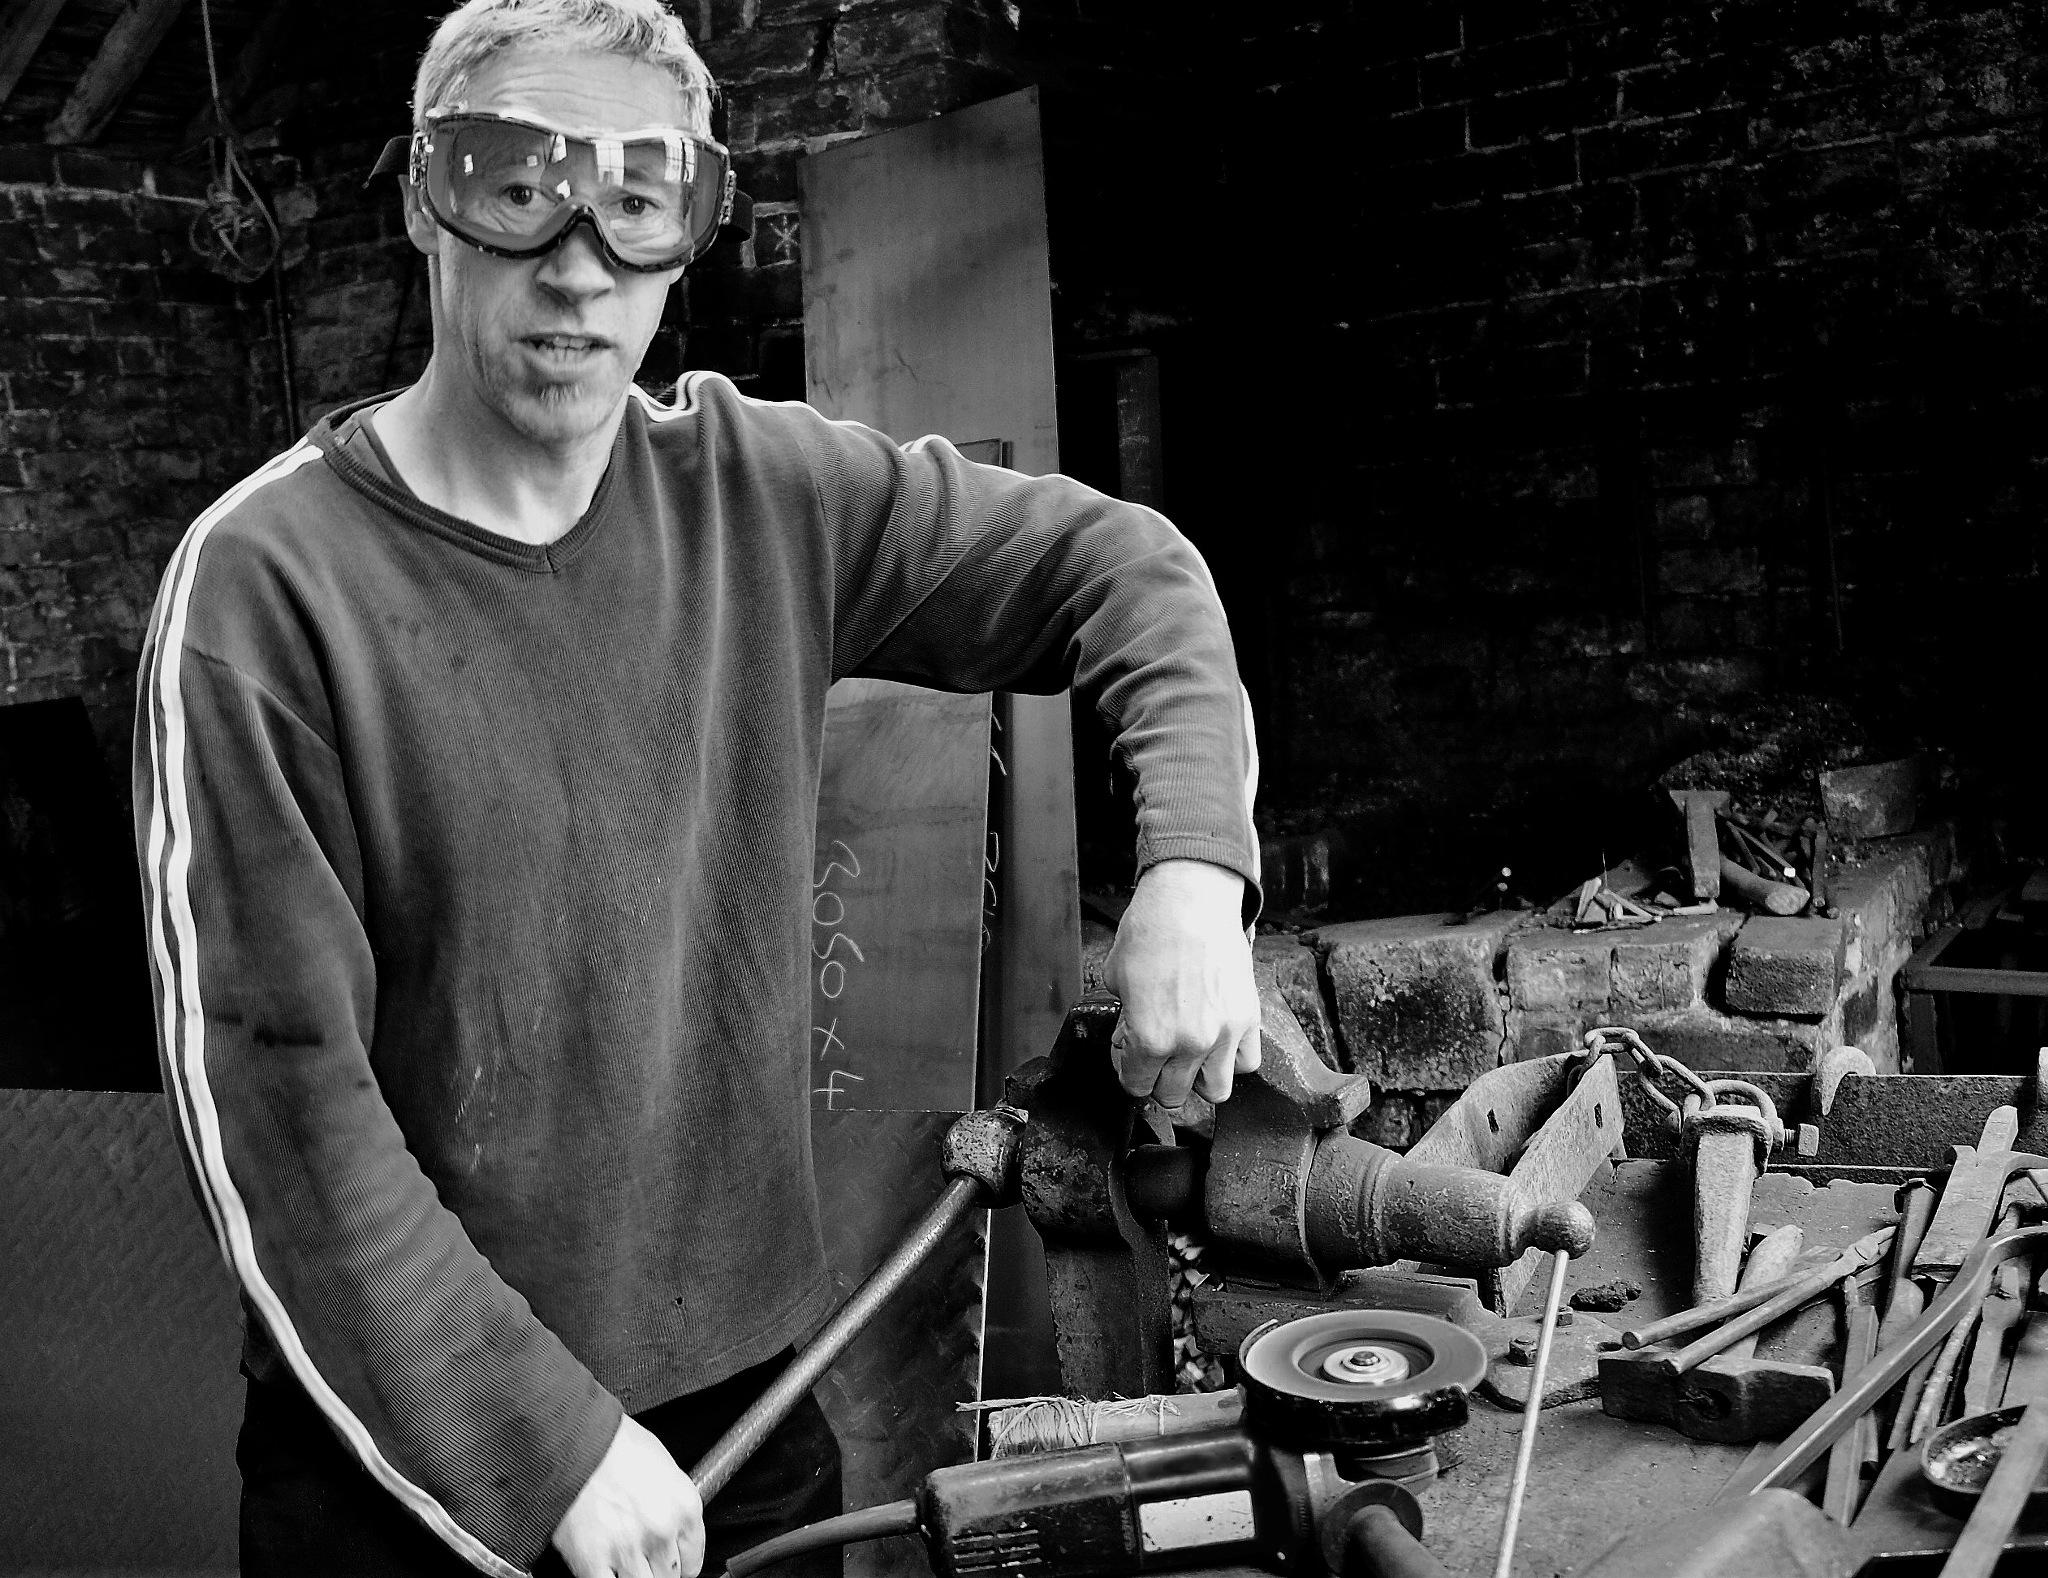 The Blacksmith,Banbury in Oxfordshire  by Jim Darke